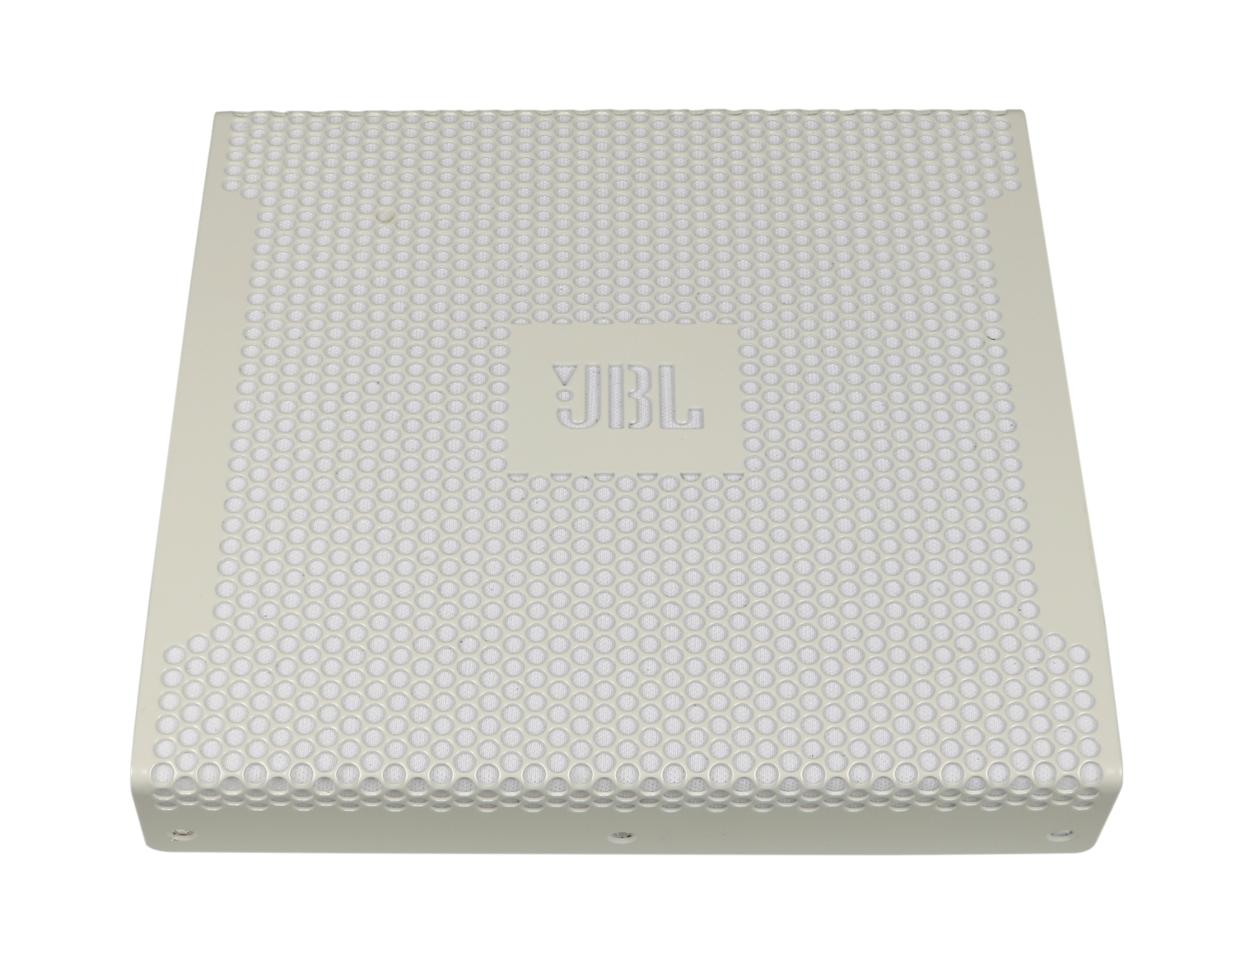 White Grille for VRX928LA-WH